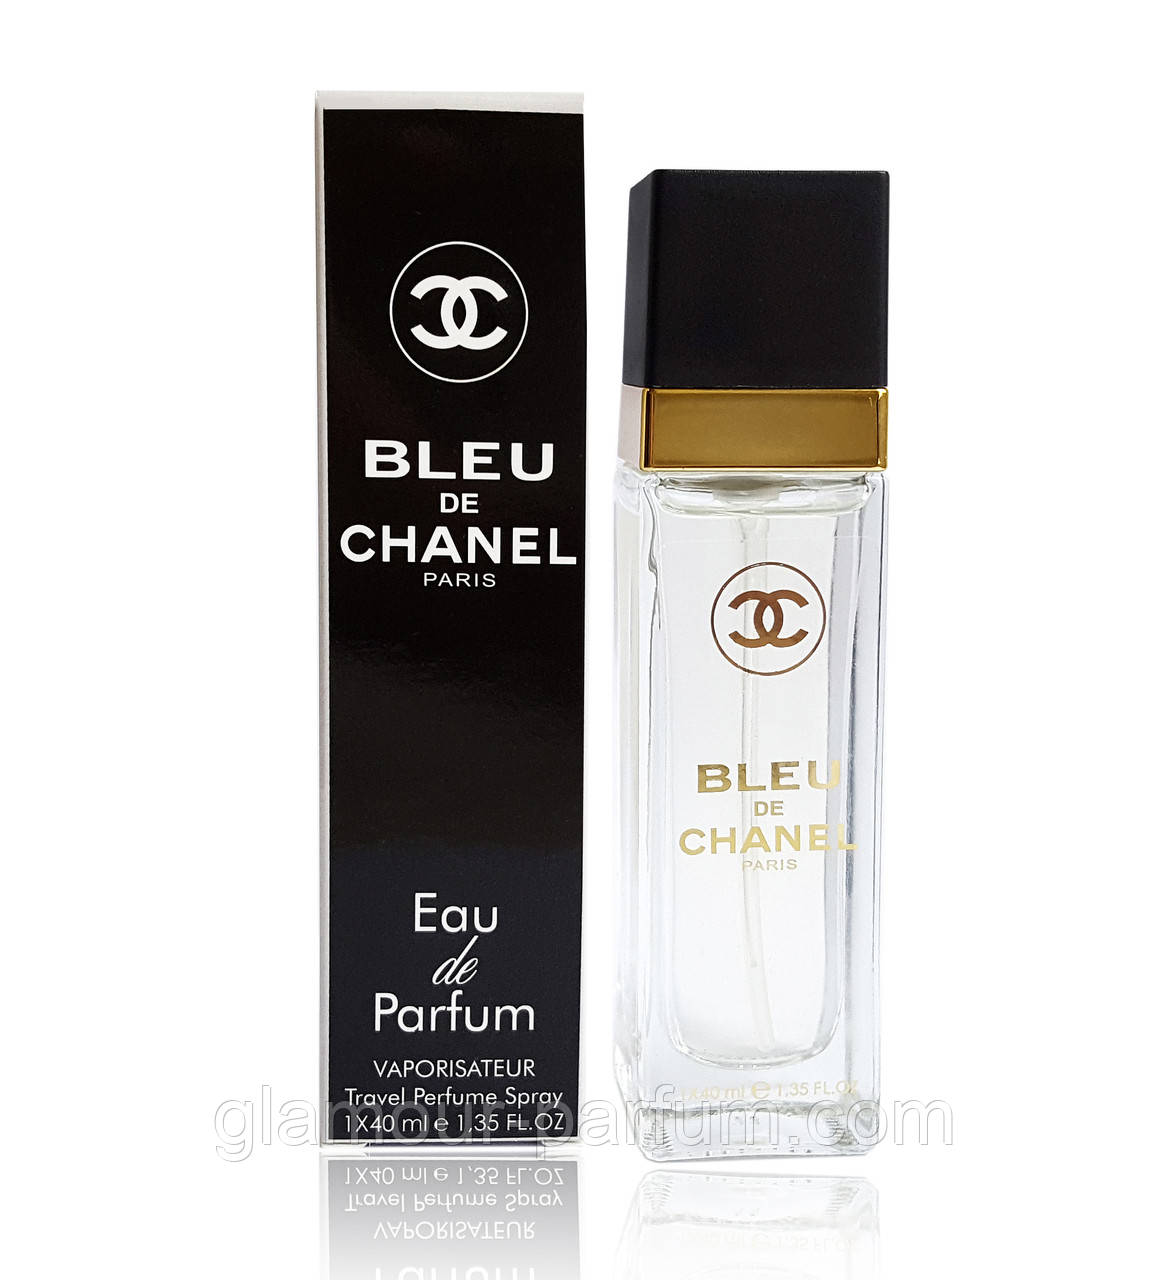 Chanel Bleu De Chanel шанель блю дэ шанель 40 мл цена 76 грн